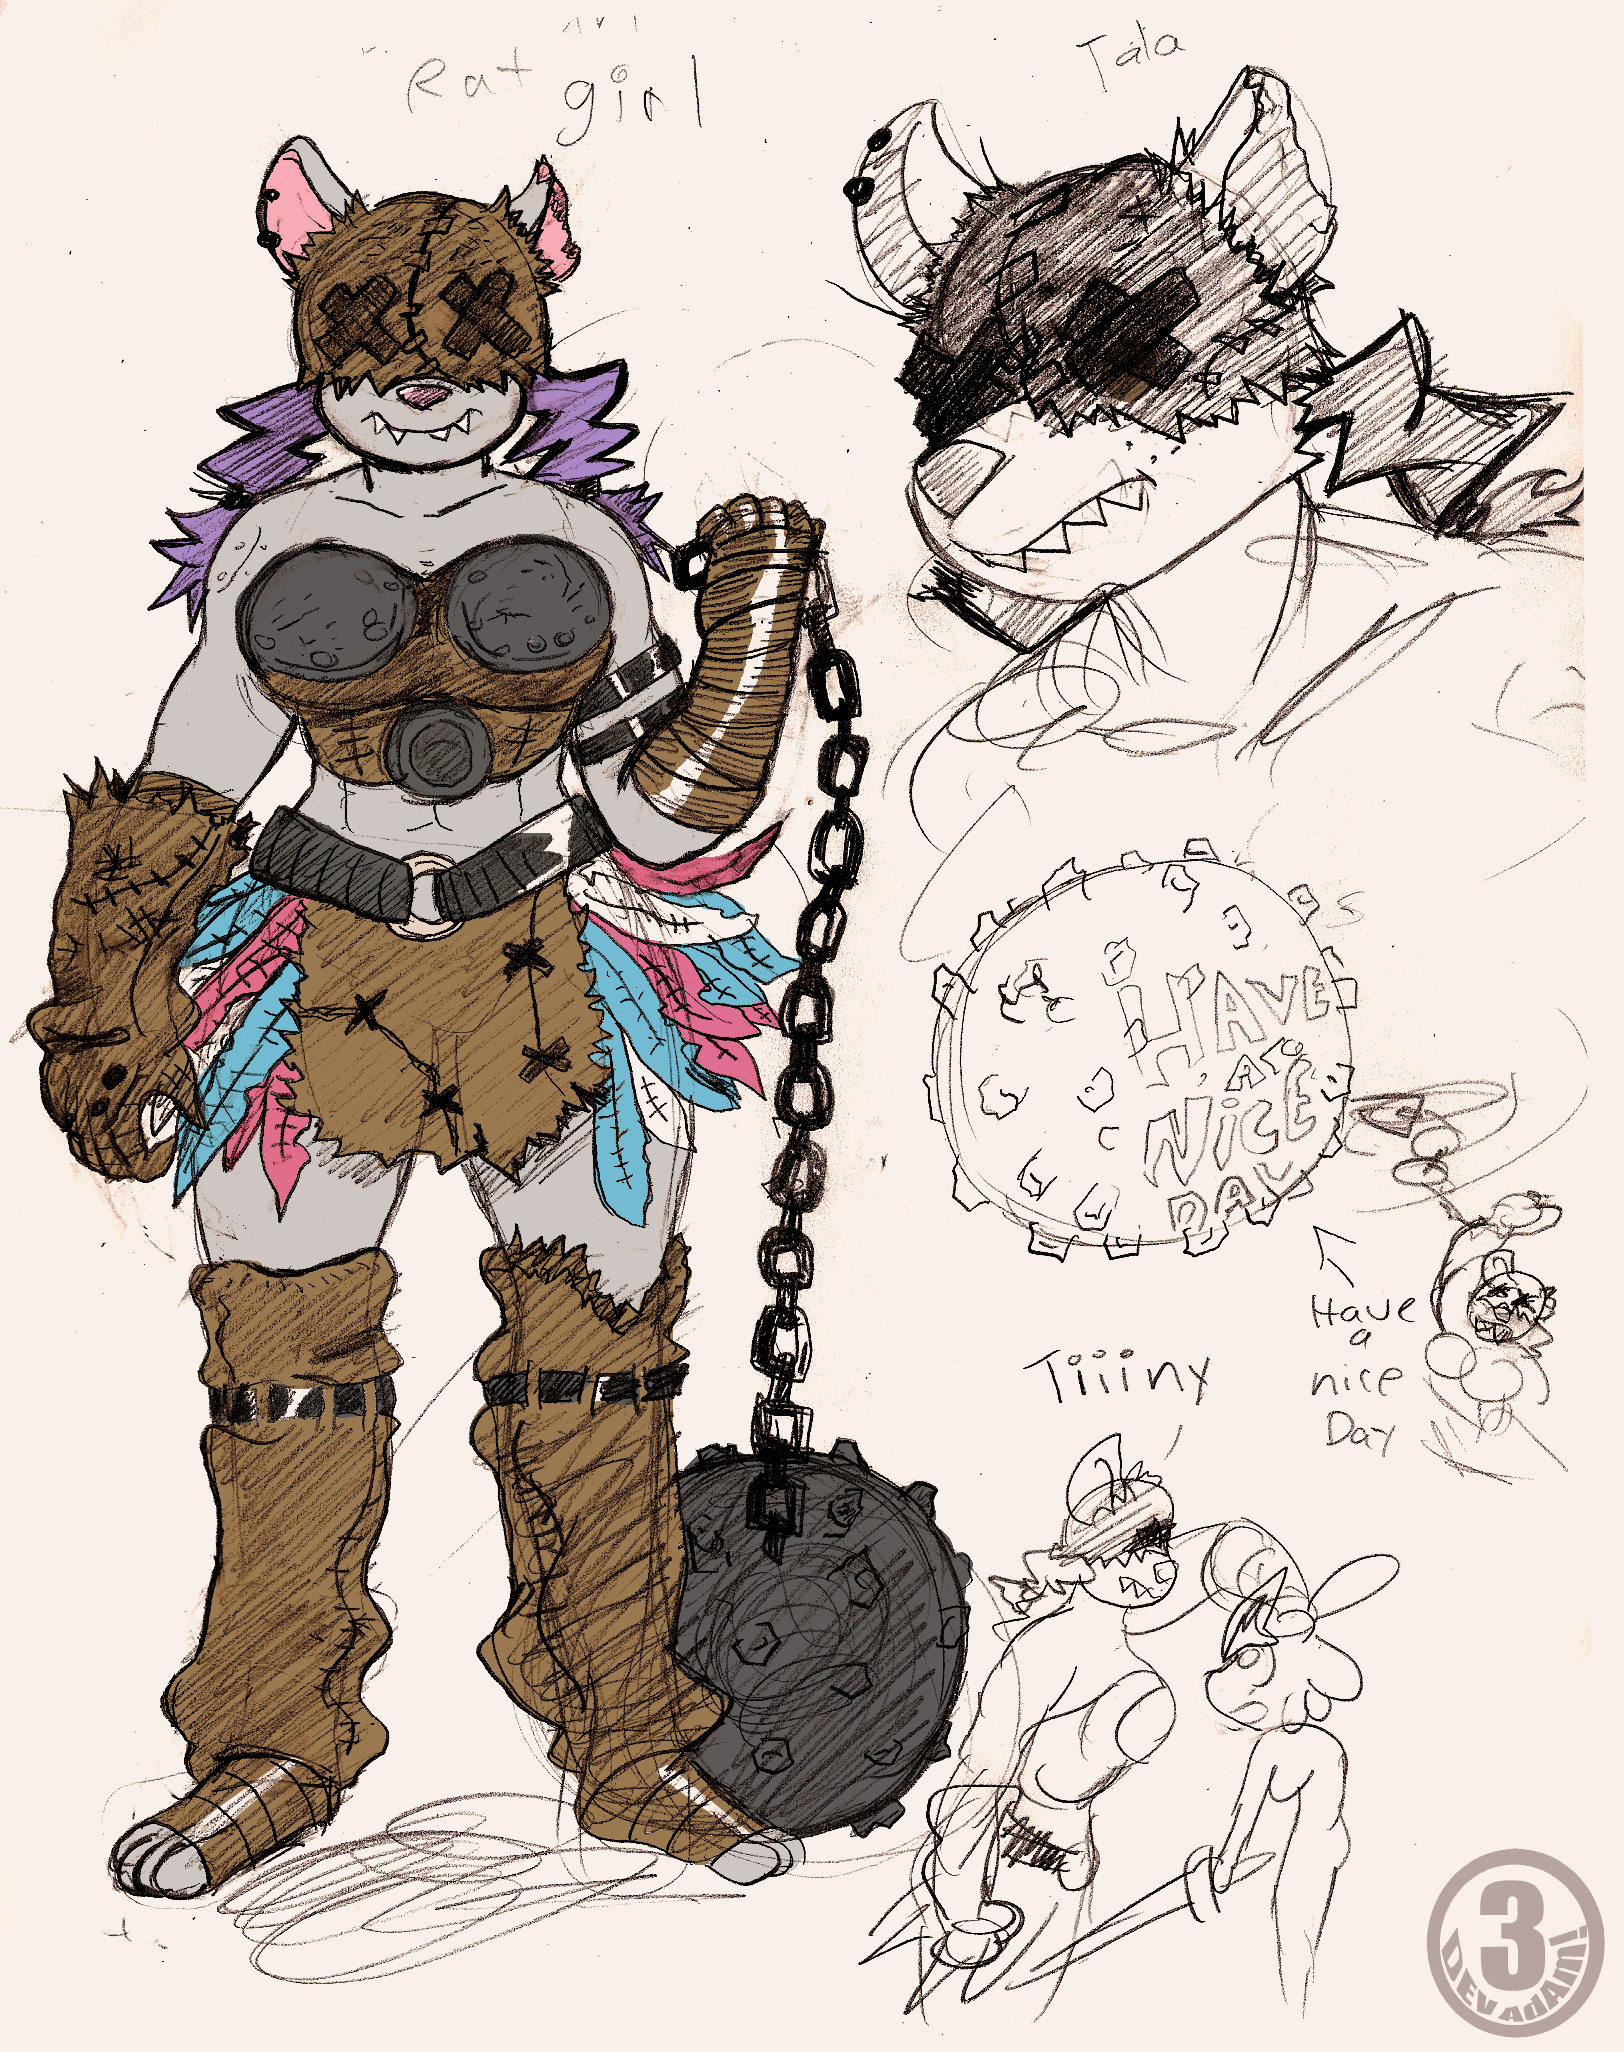 Barbarian Rat Girl Concept by Chooy64